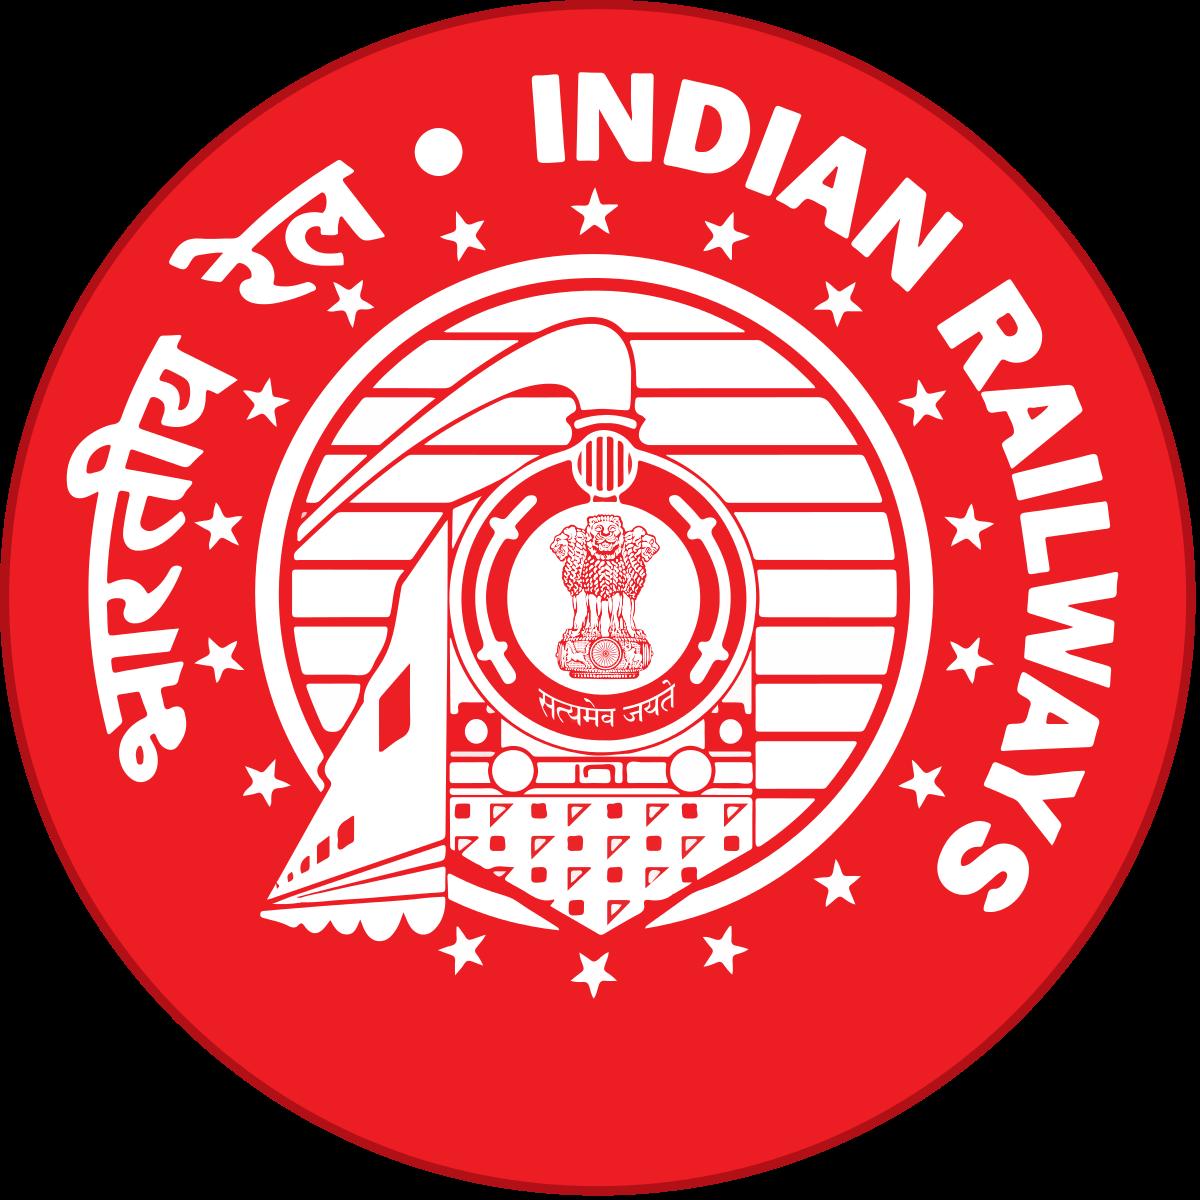 Recruitment niyukti . Track clipart railway indian track